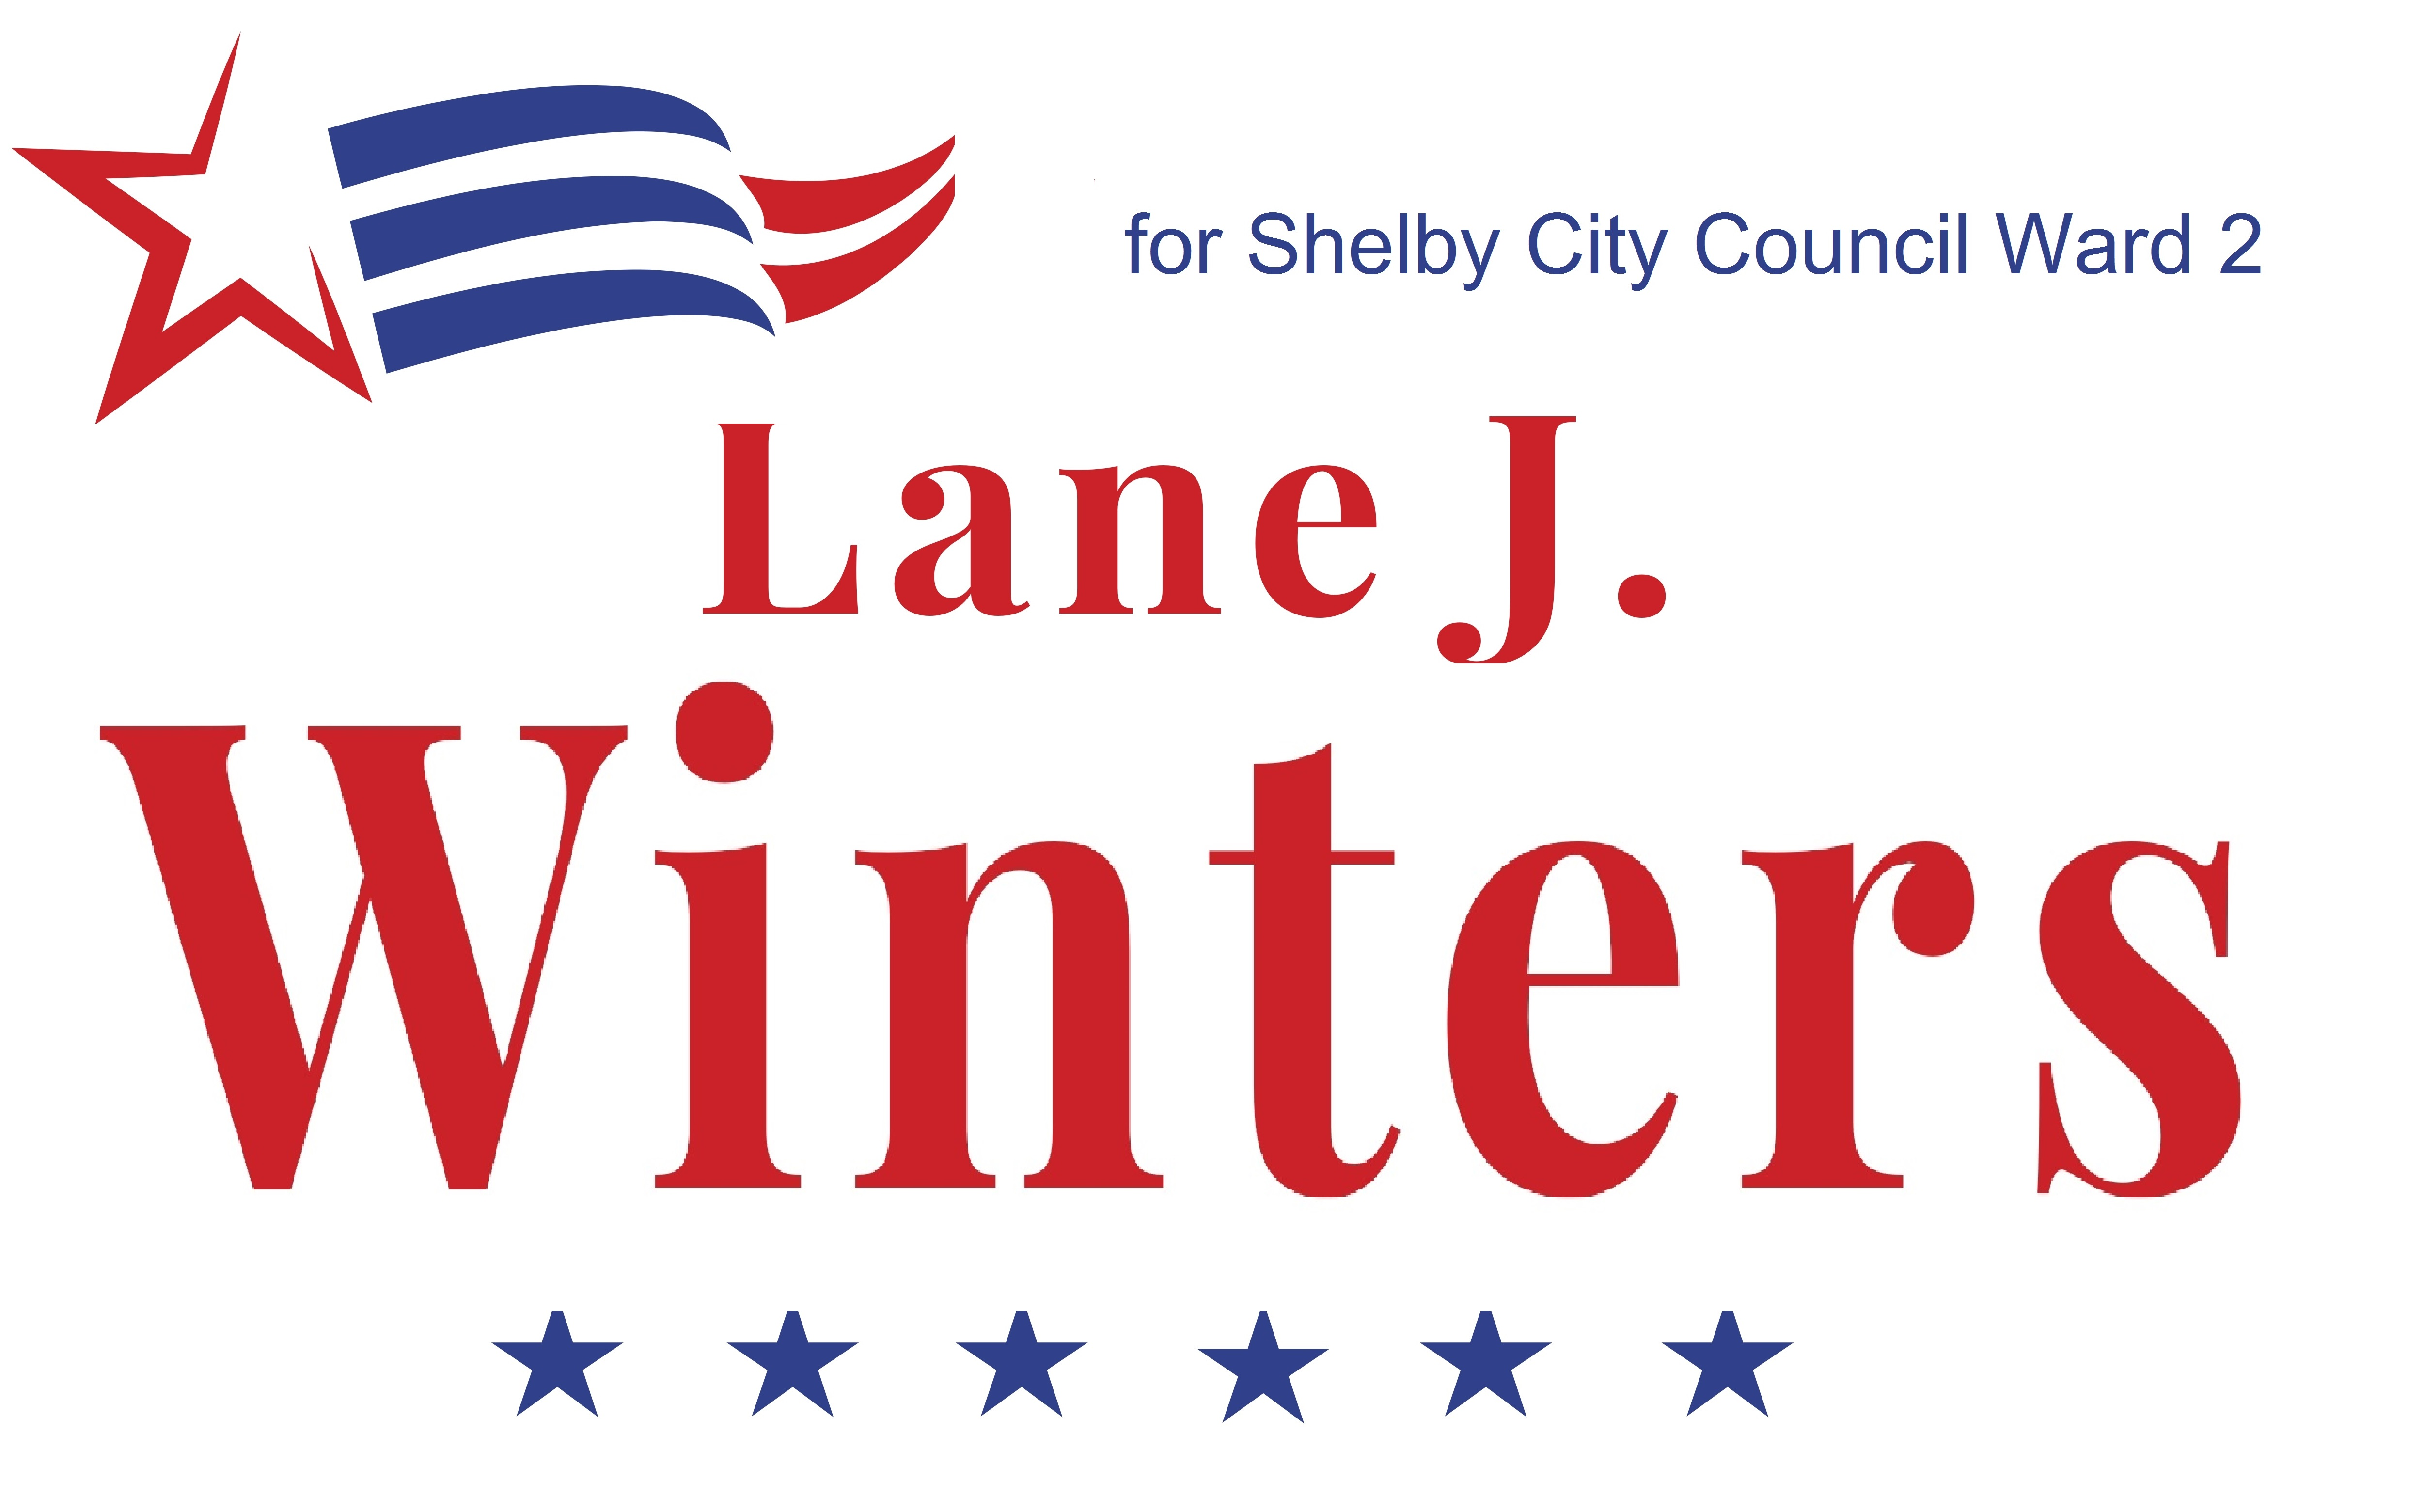 Lane J Winters